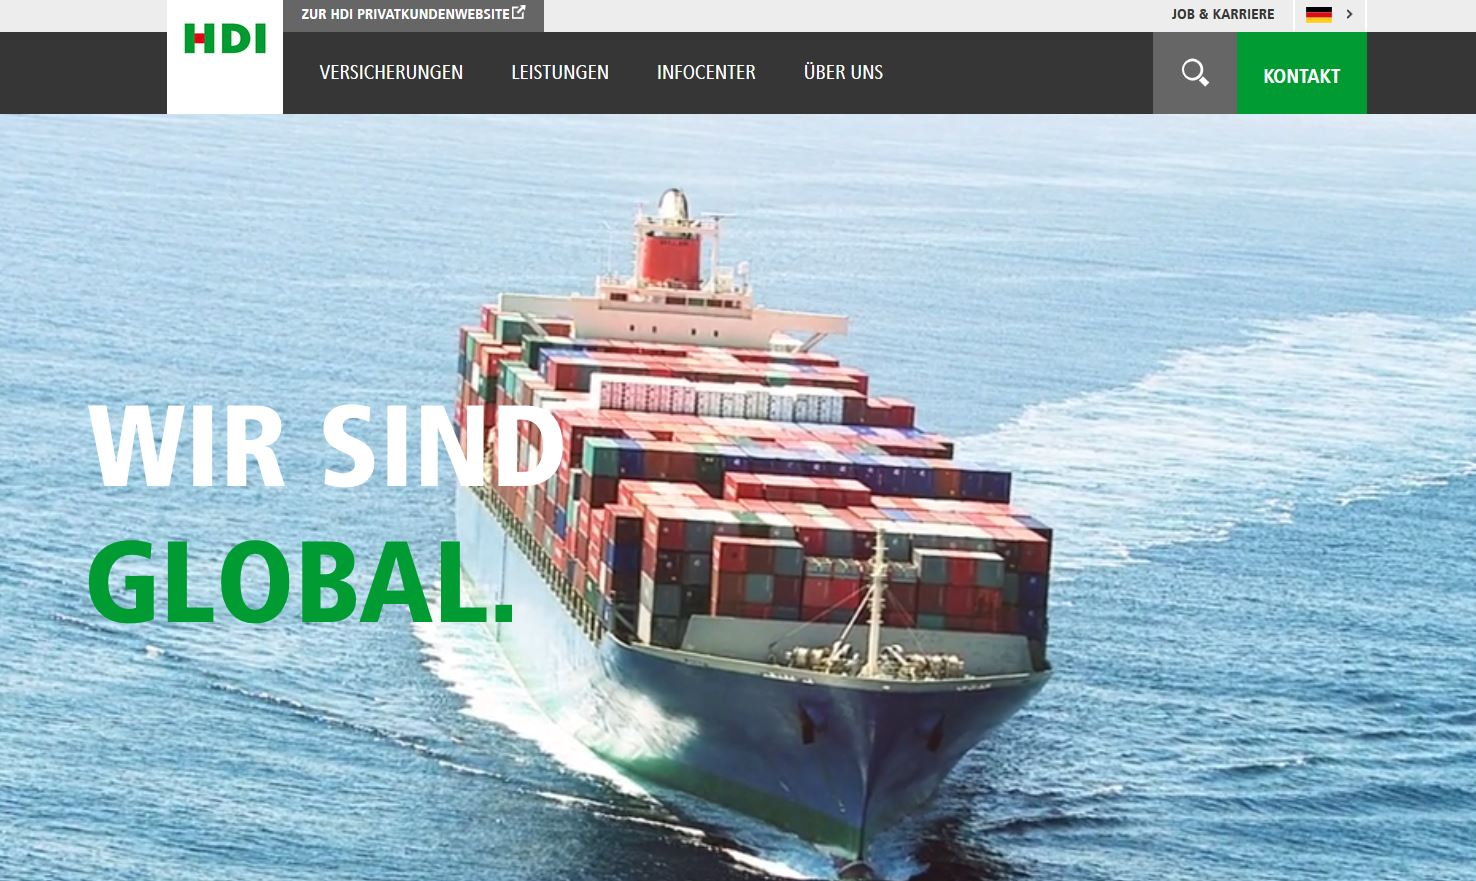 Herausforderung Markenrelaunch – aus HDI-Gerling wird HDI Global SE